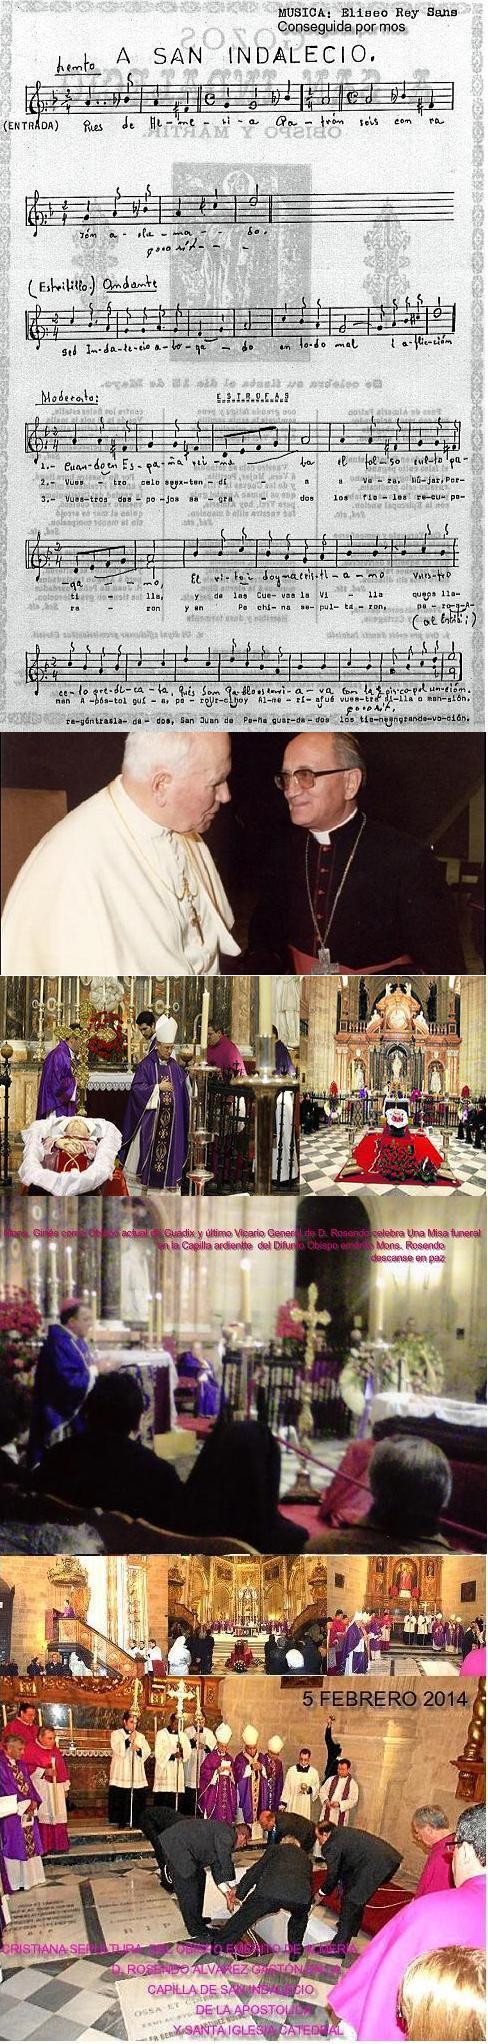 20140217120643-musicagozos-indalecio-ersans-1899capillasan-indalecio-vicario-general.jpg